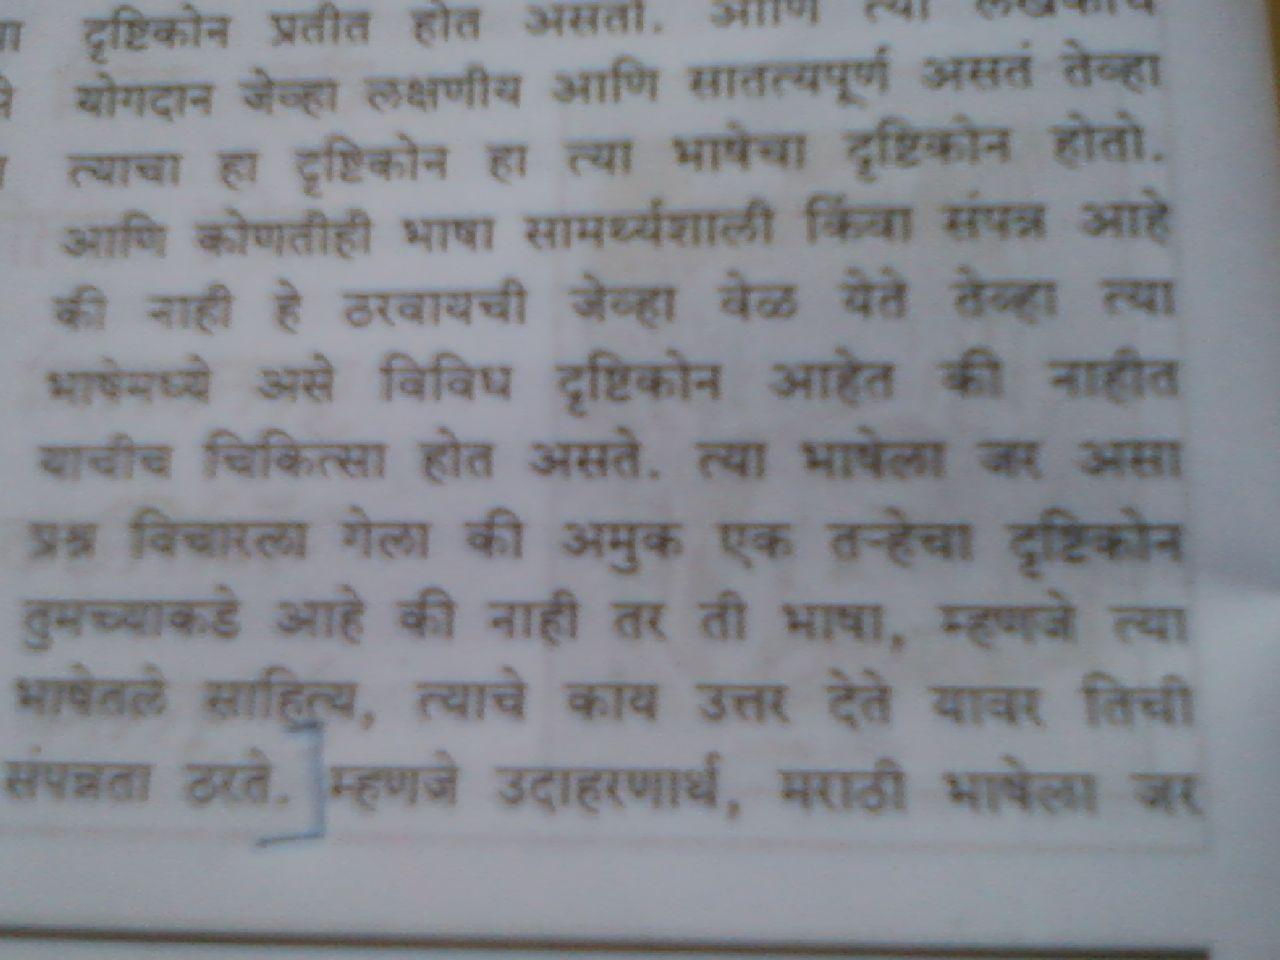 Essay on nature my friend  in marathi Homework Academic Service